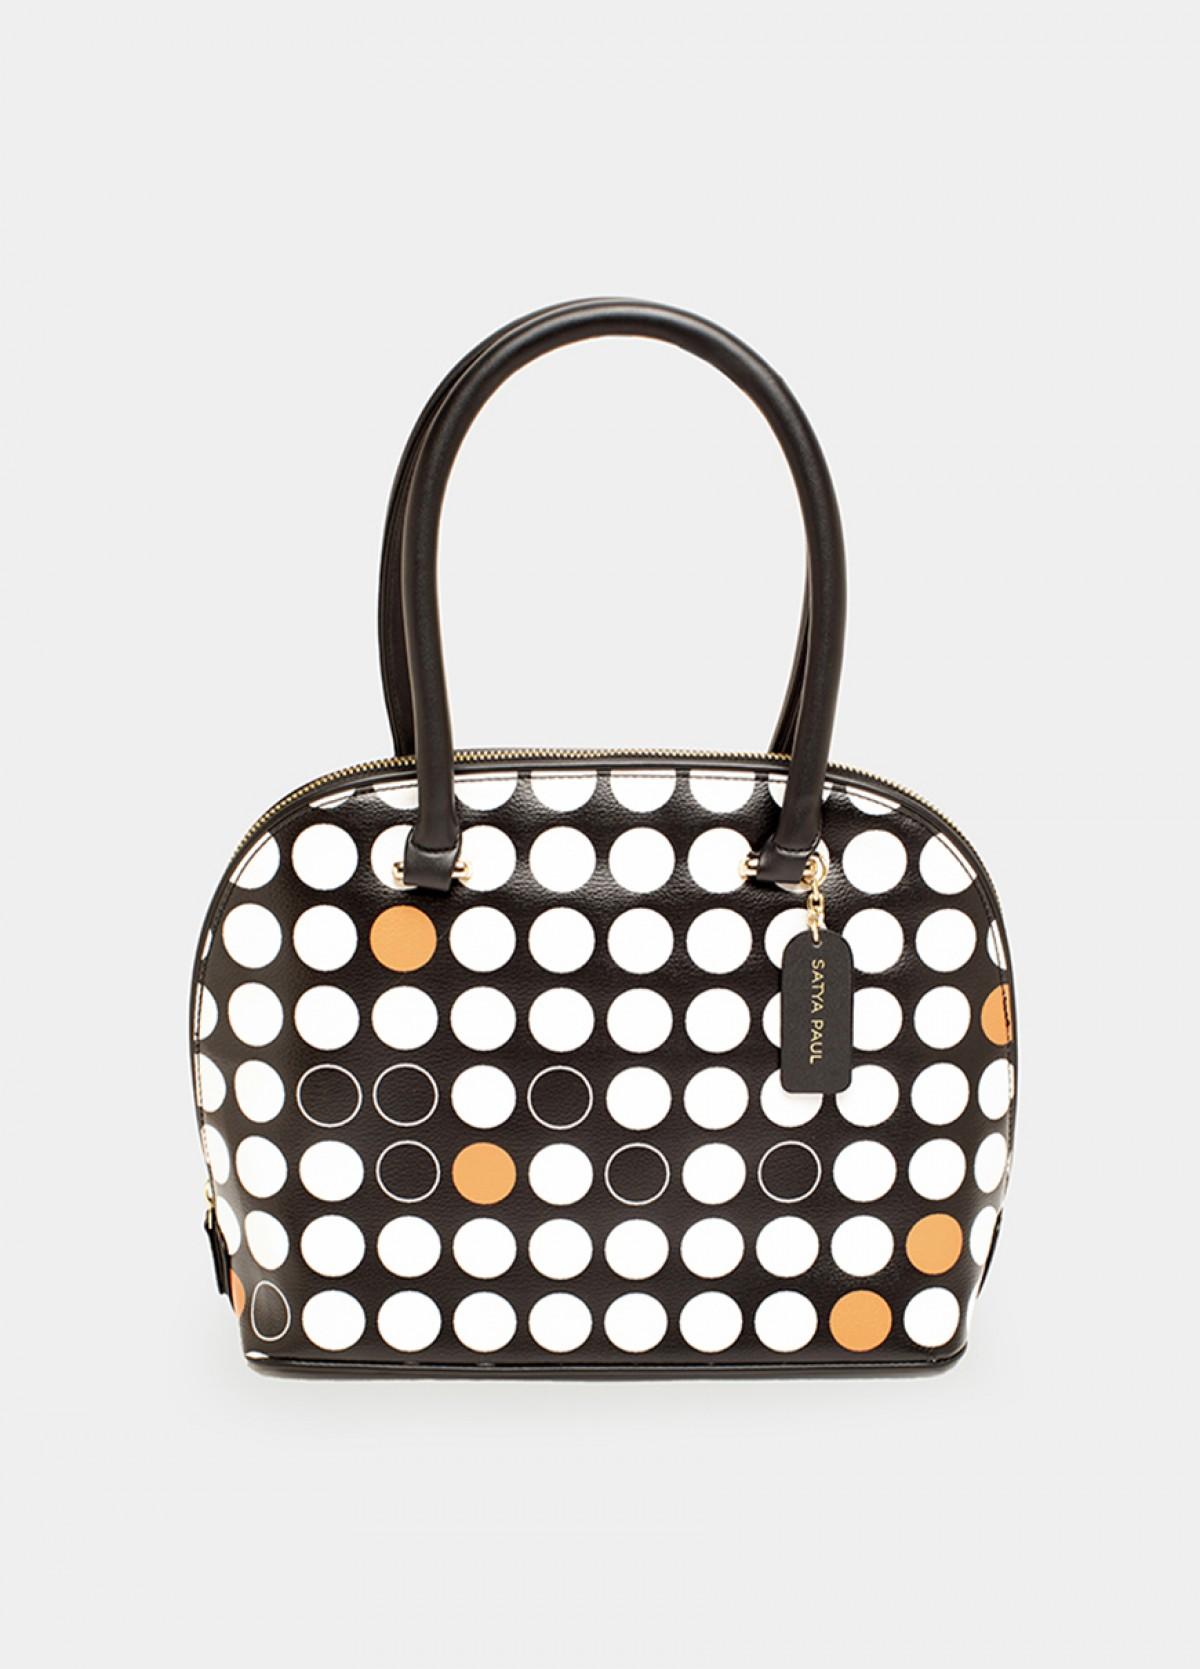 The Furano Handbag